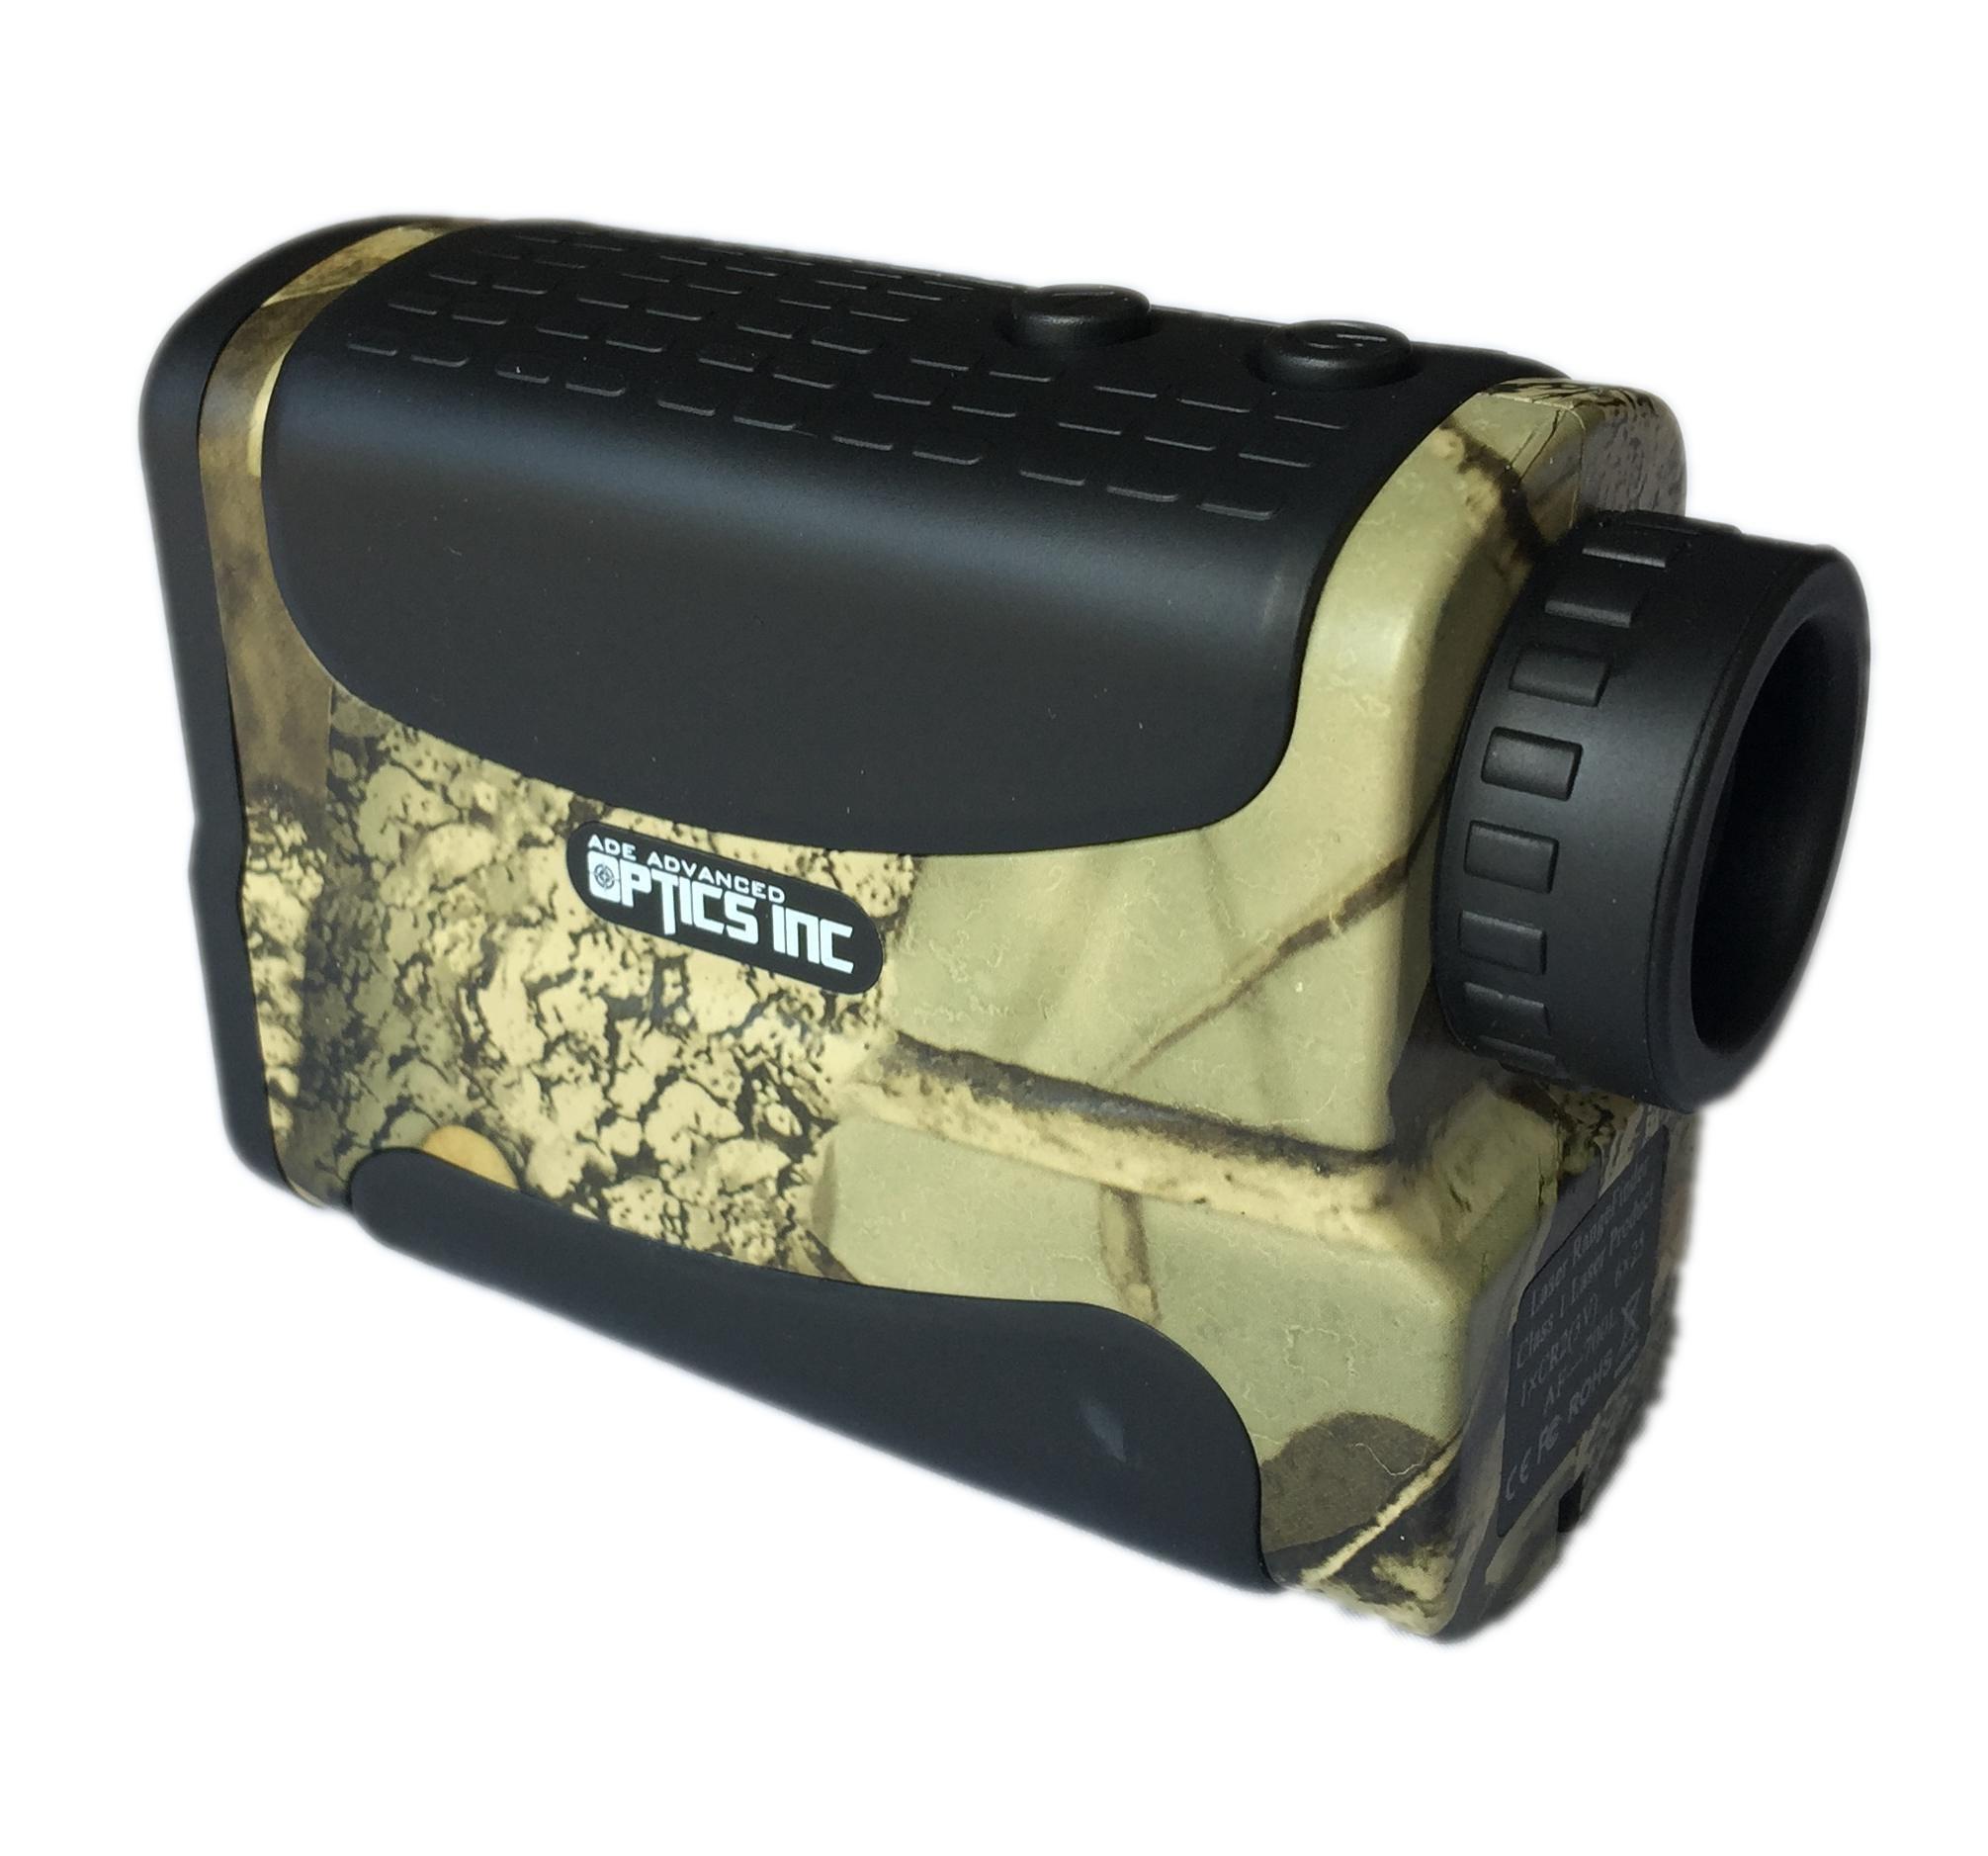 Ade Advanced Optics Golf Rangefinder Hunting Range Finder with PinSeeker Laser Binoculars, Camouflage by Ade Advanced Optics (Image #3)